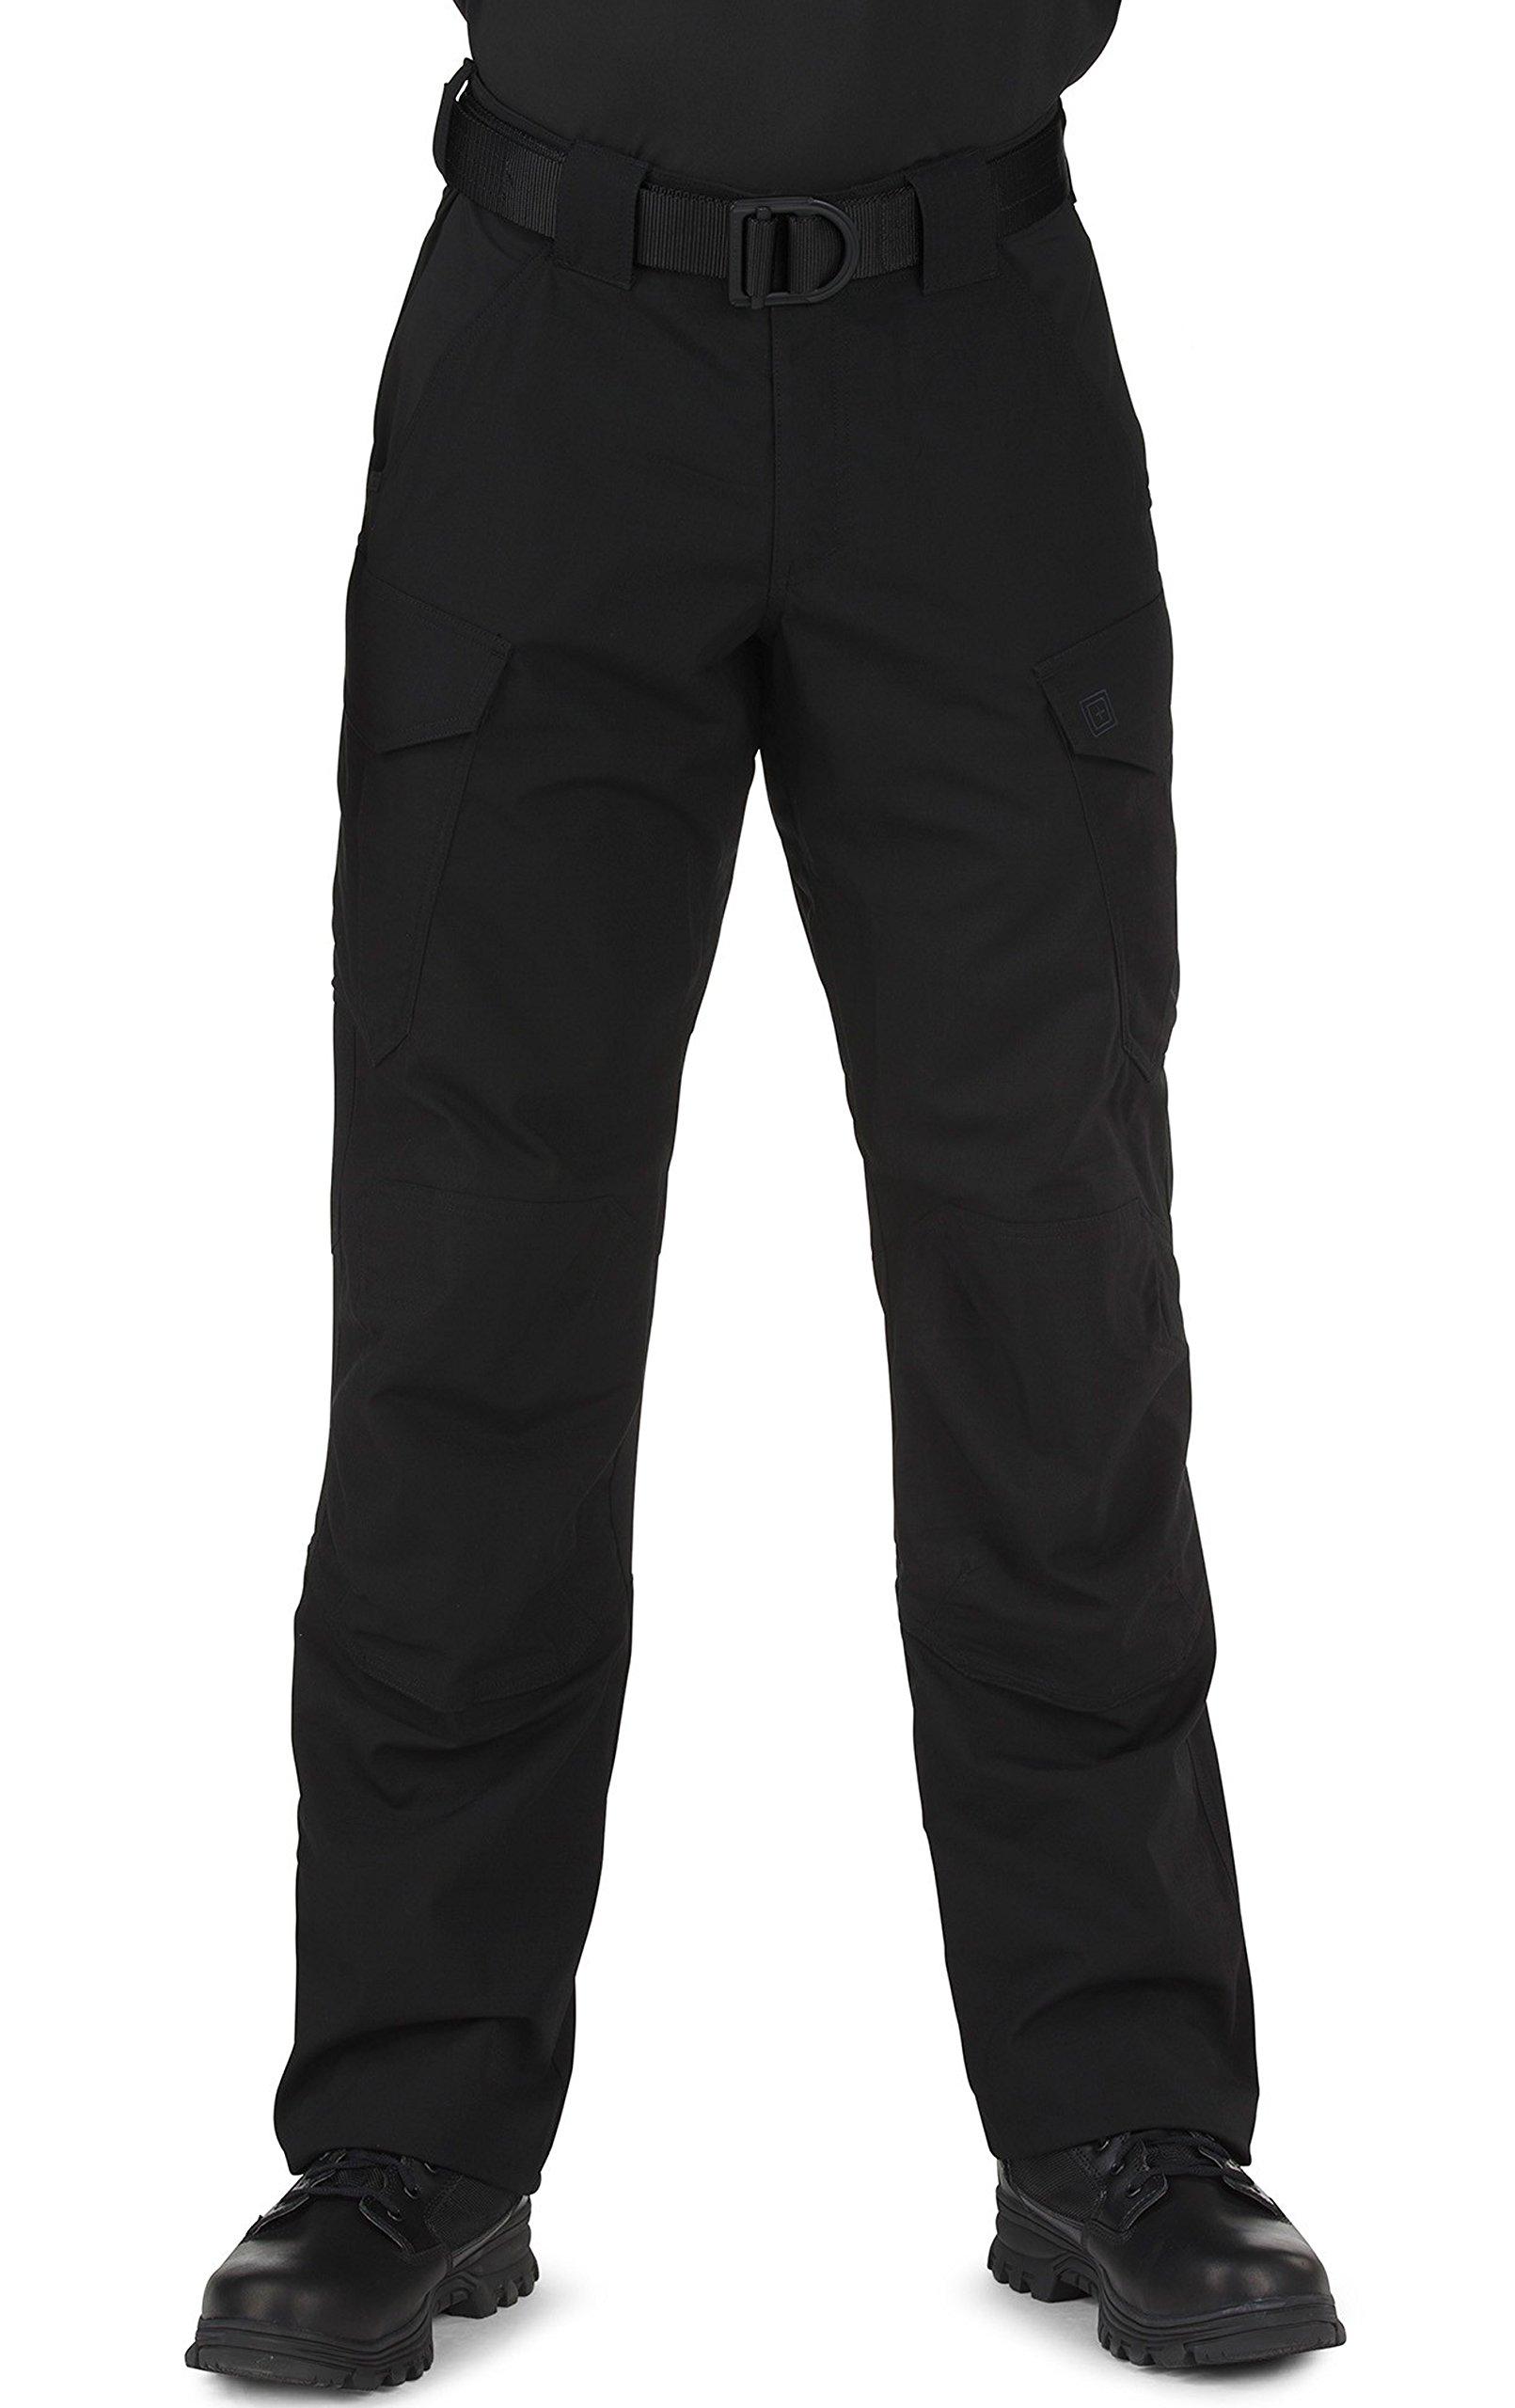 5.11 Men's Stryke TDU Pants, Black, 36-Waist/30-Length